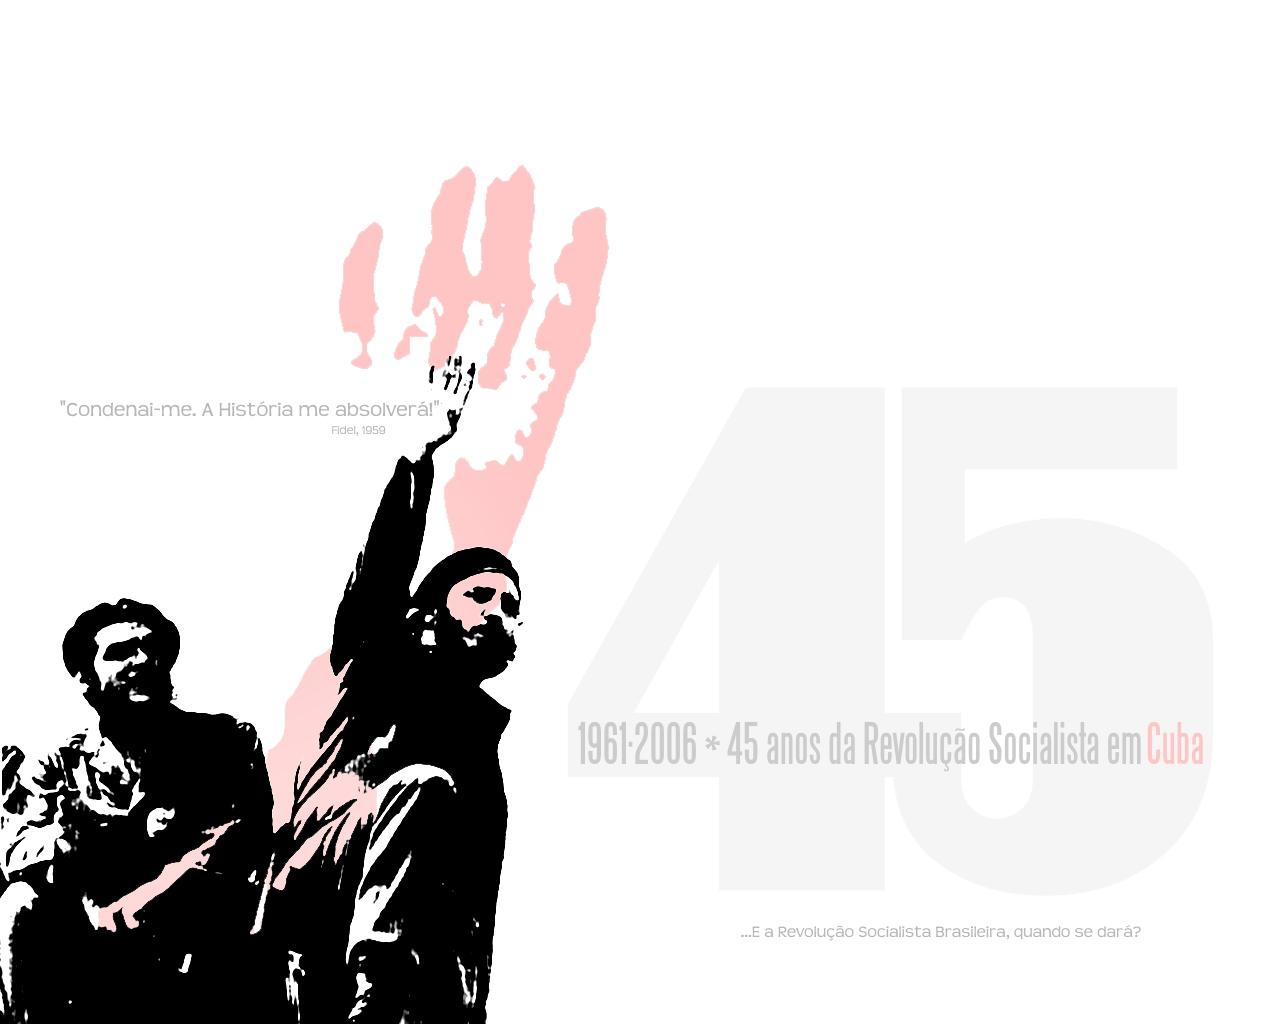 Socialist Wallpaper Cuban socialist revolution by 1280x1024